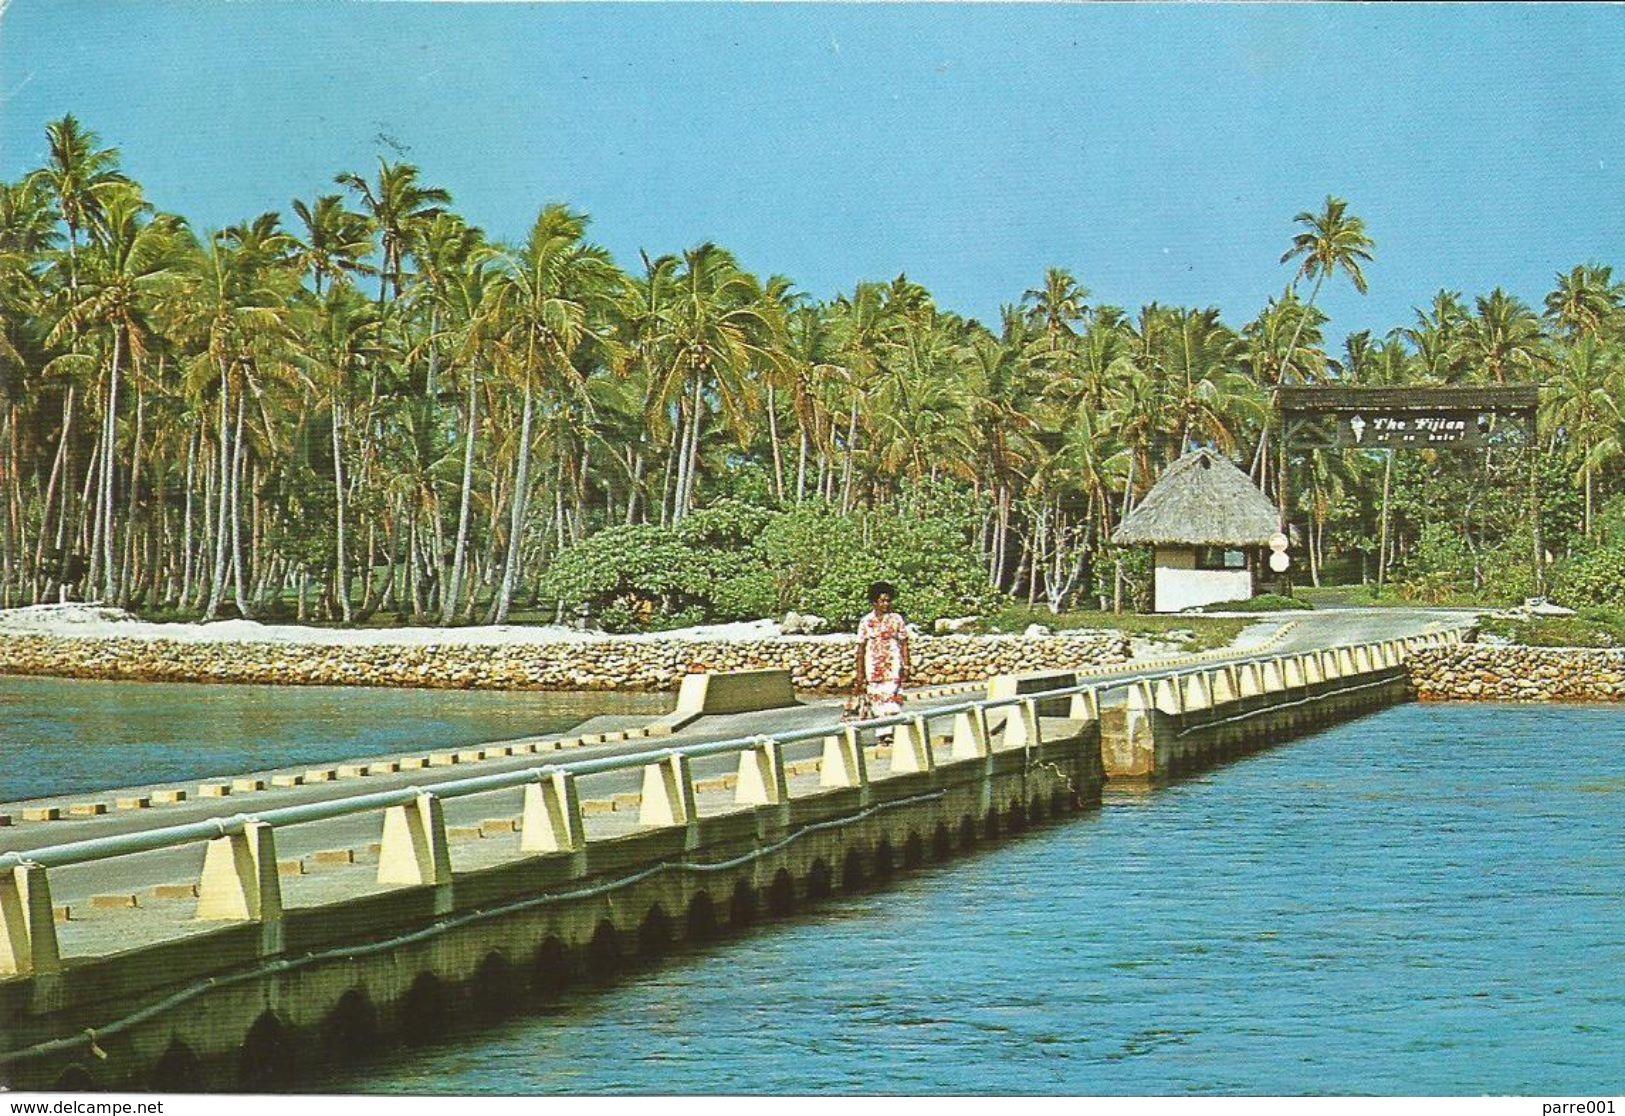 Fiji 1995 Suva Spotted Gecko Reptile Viewcard - Fiji (1970-...)